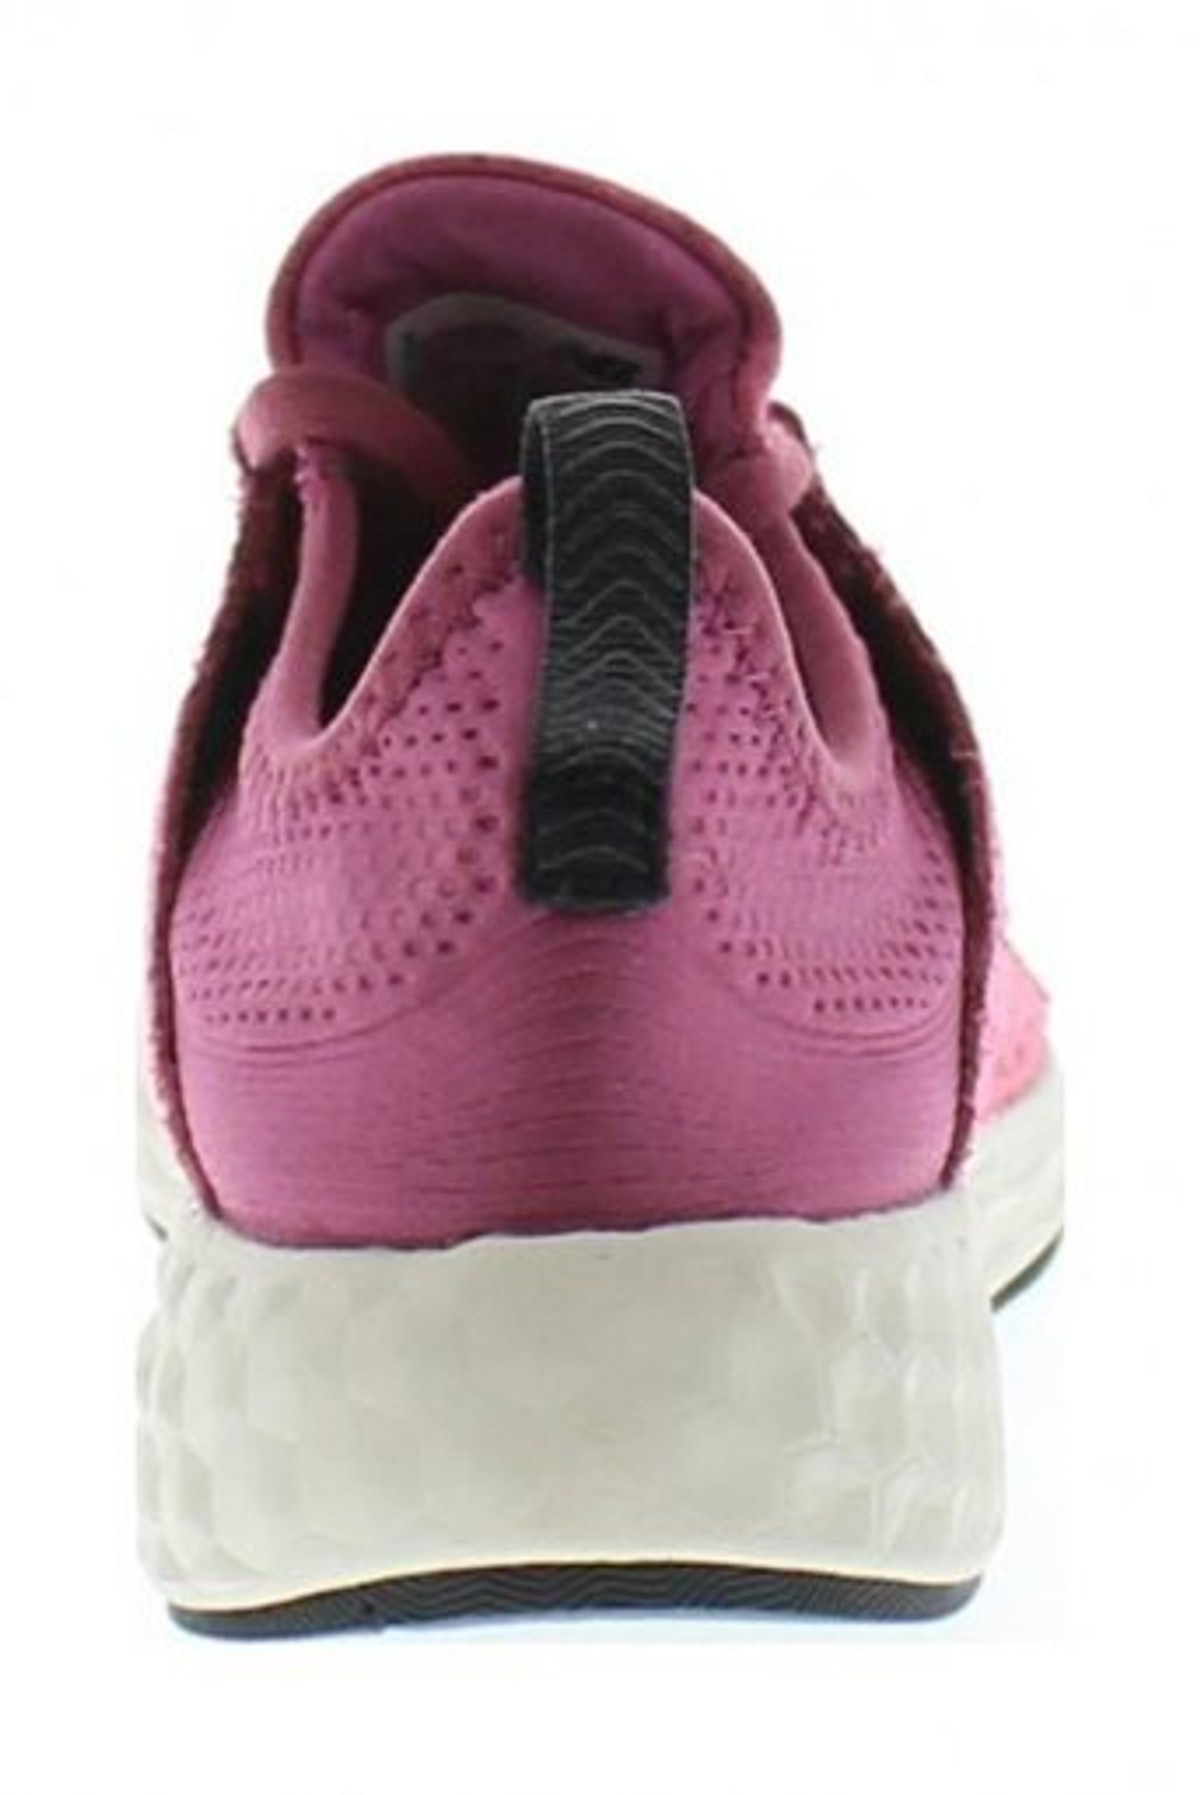 Women's Fresh Foam Cruz Sneakers WCRUZHM